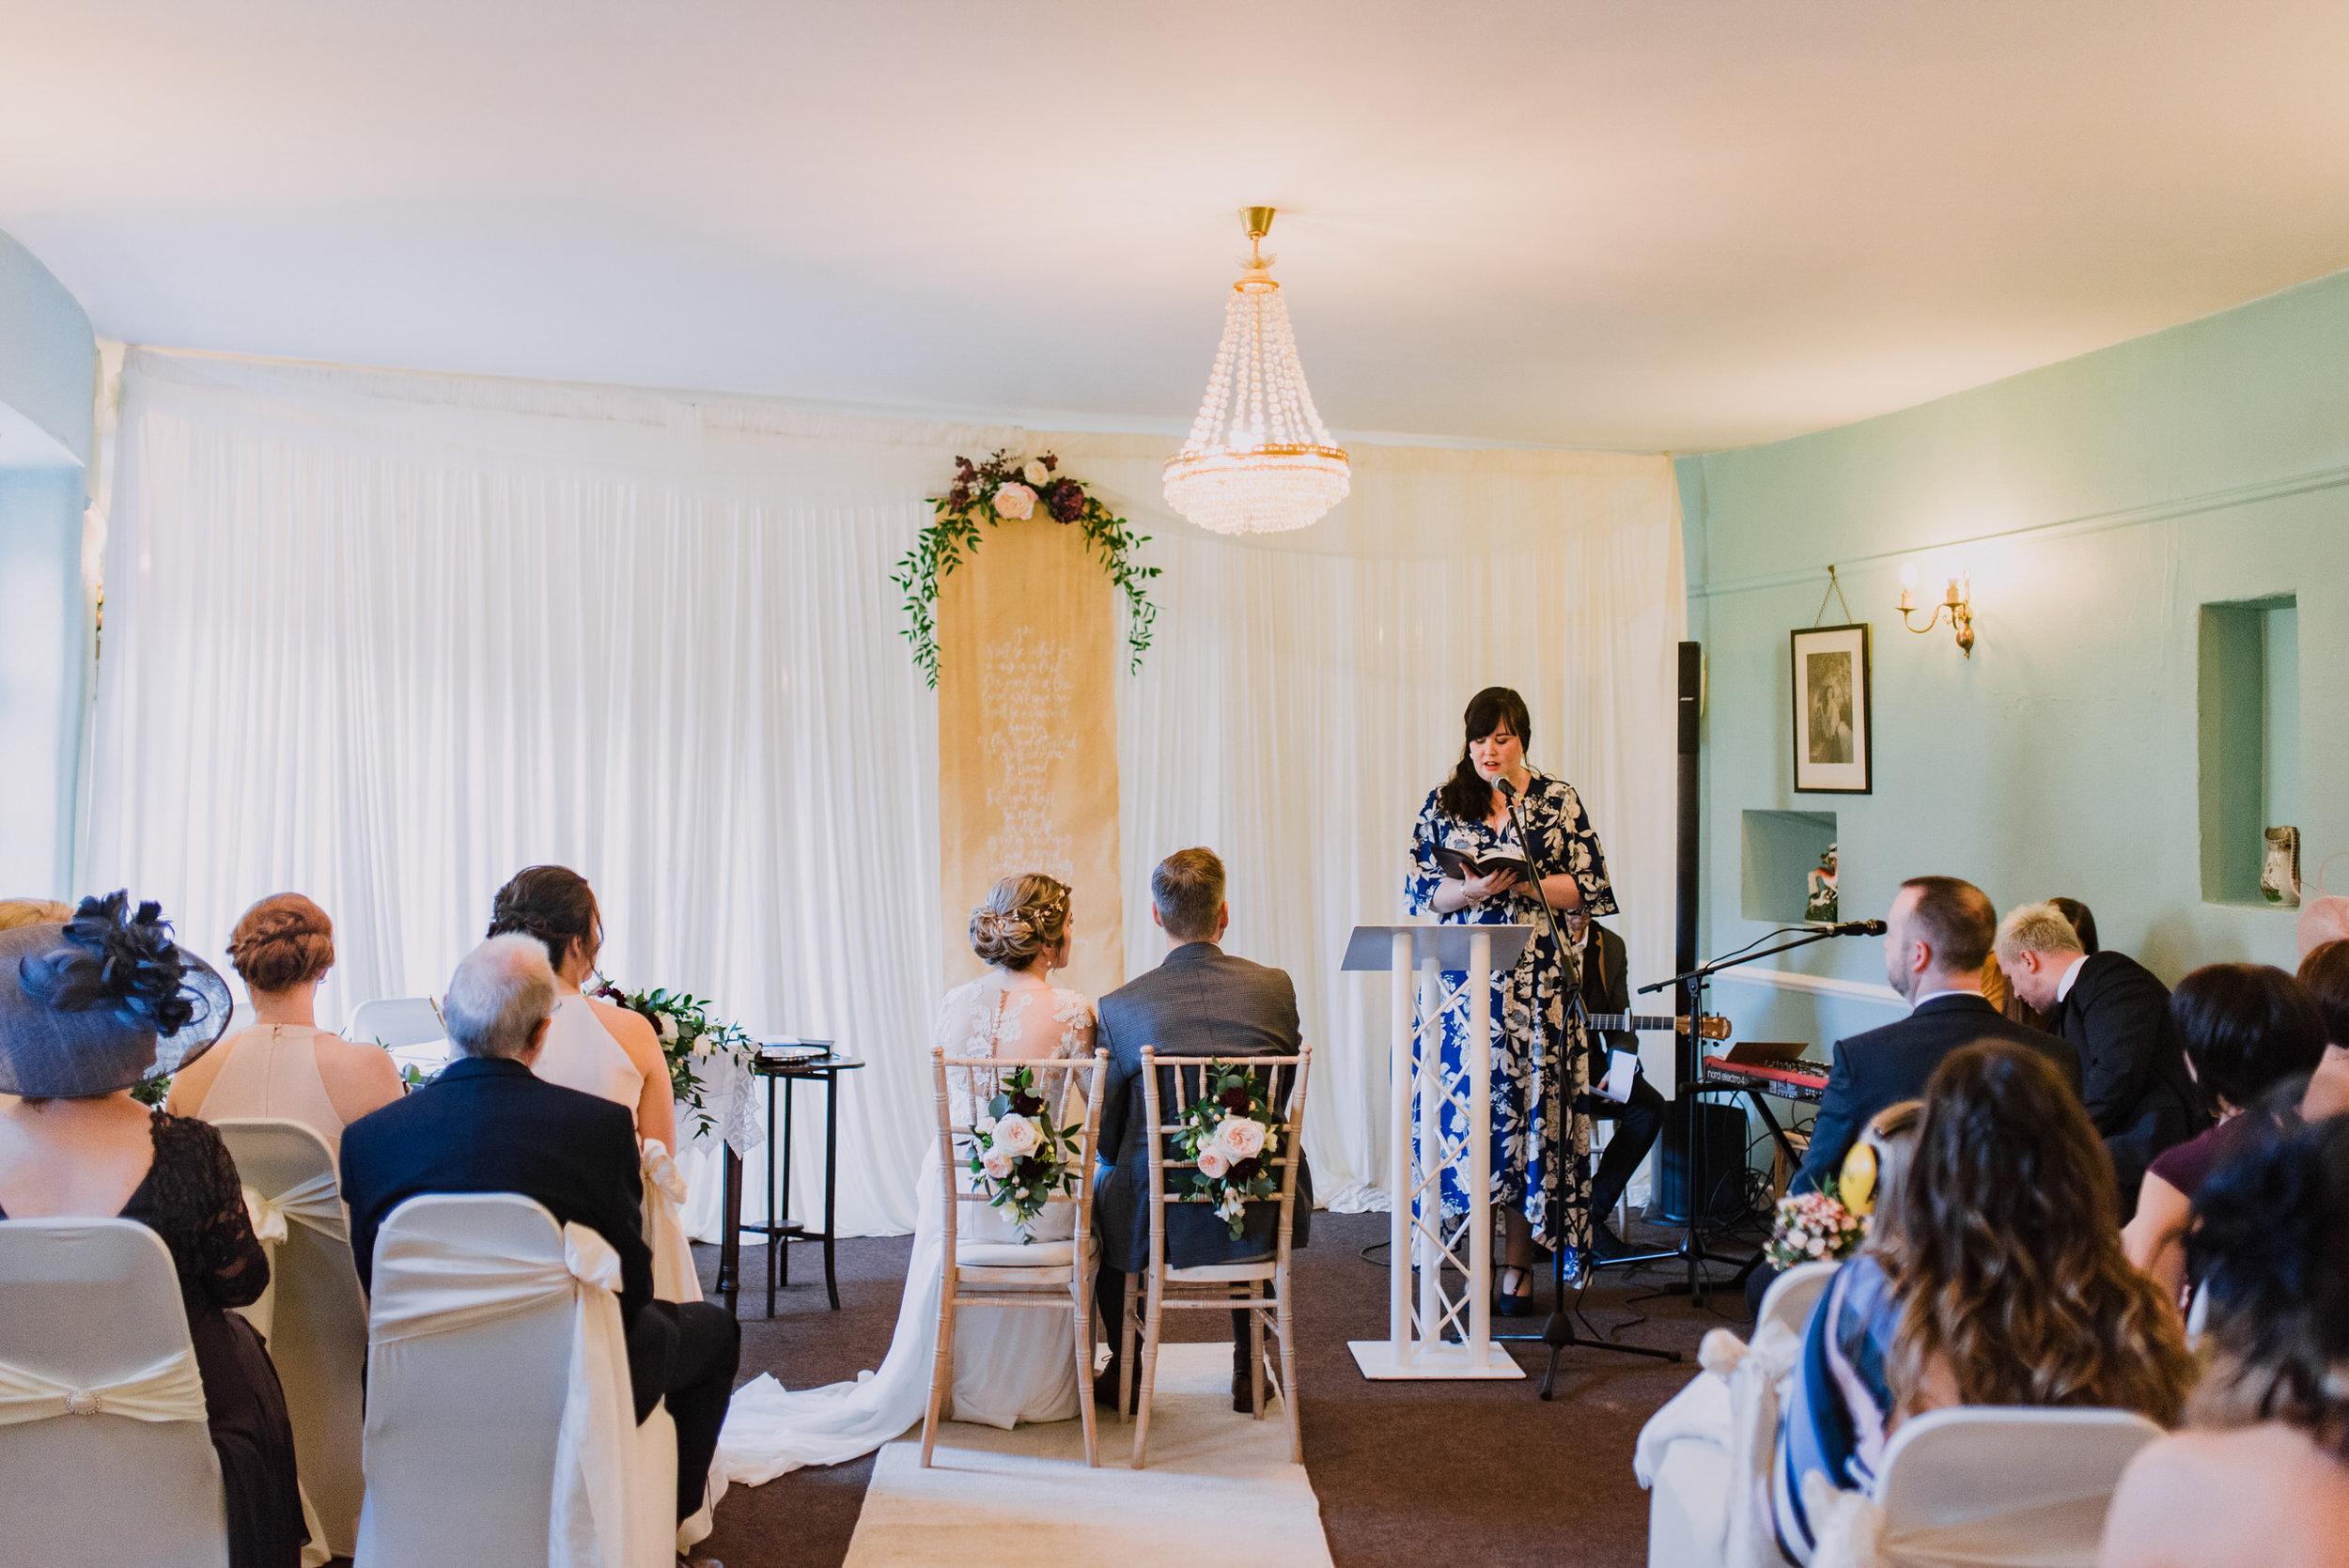 lissanoure castle wedding, northern ireland wedding photographer, romantic northern irish wedding venue, castle wedding ireland, natural wedding photography ni (62).jpg